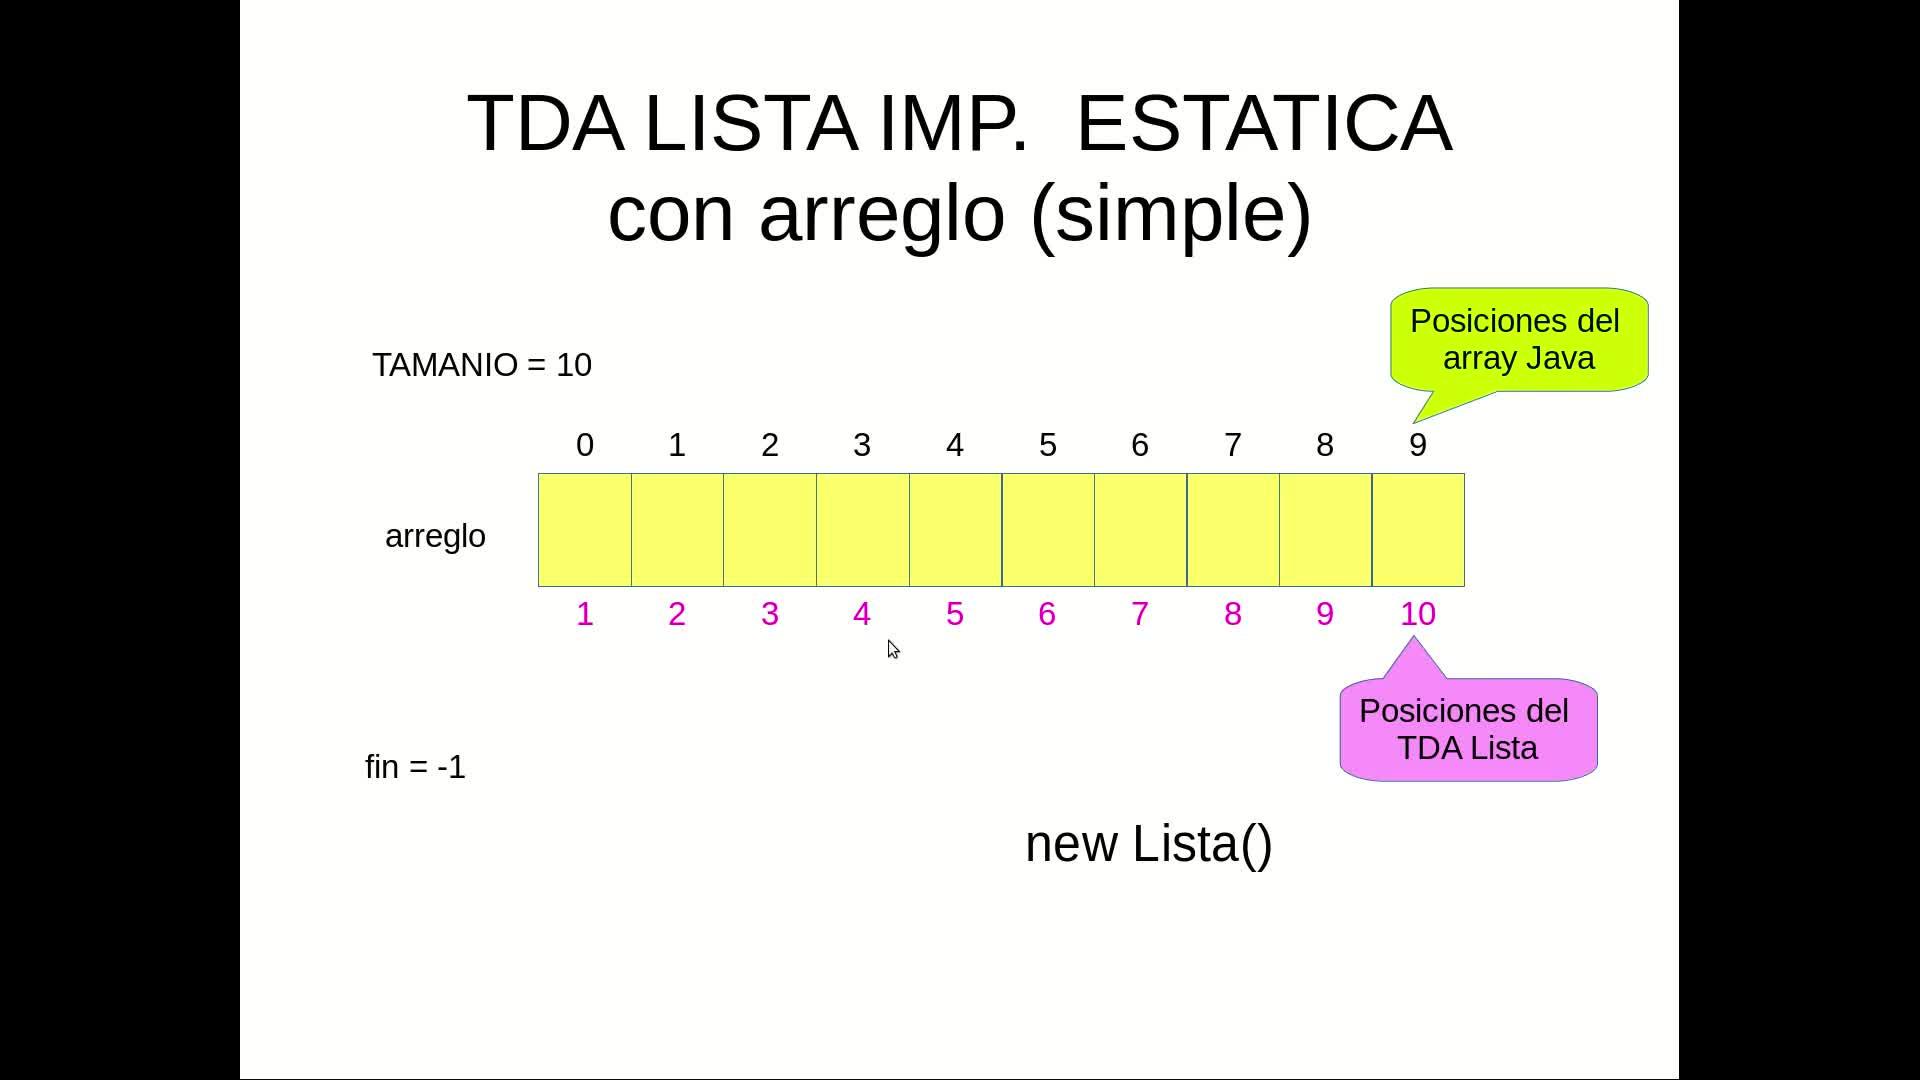 Clase 6: TDA Lista (Implementación dinamica) - Parte I